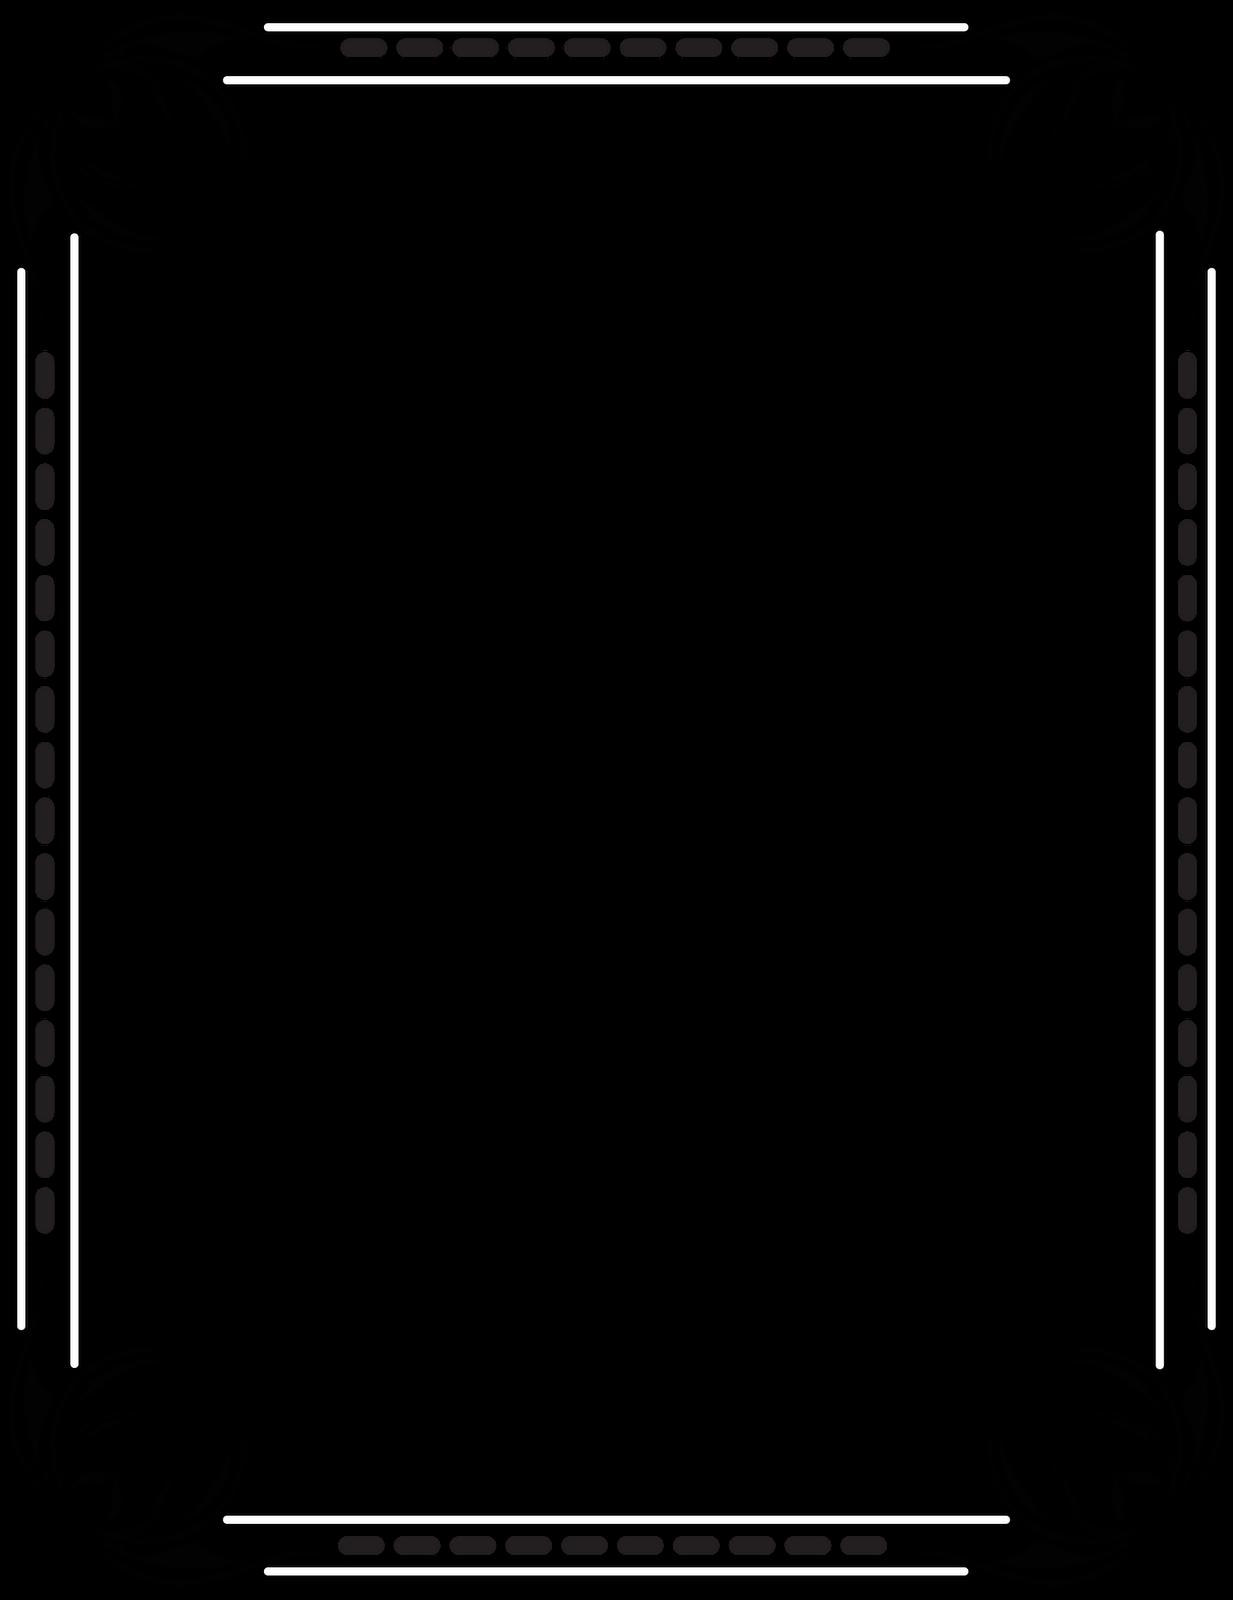 37 Corel Draw Border Designs Templates Free Download Templates